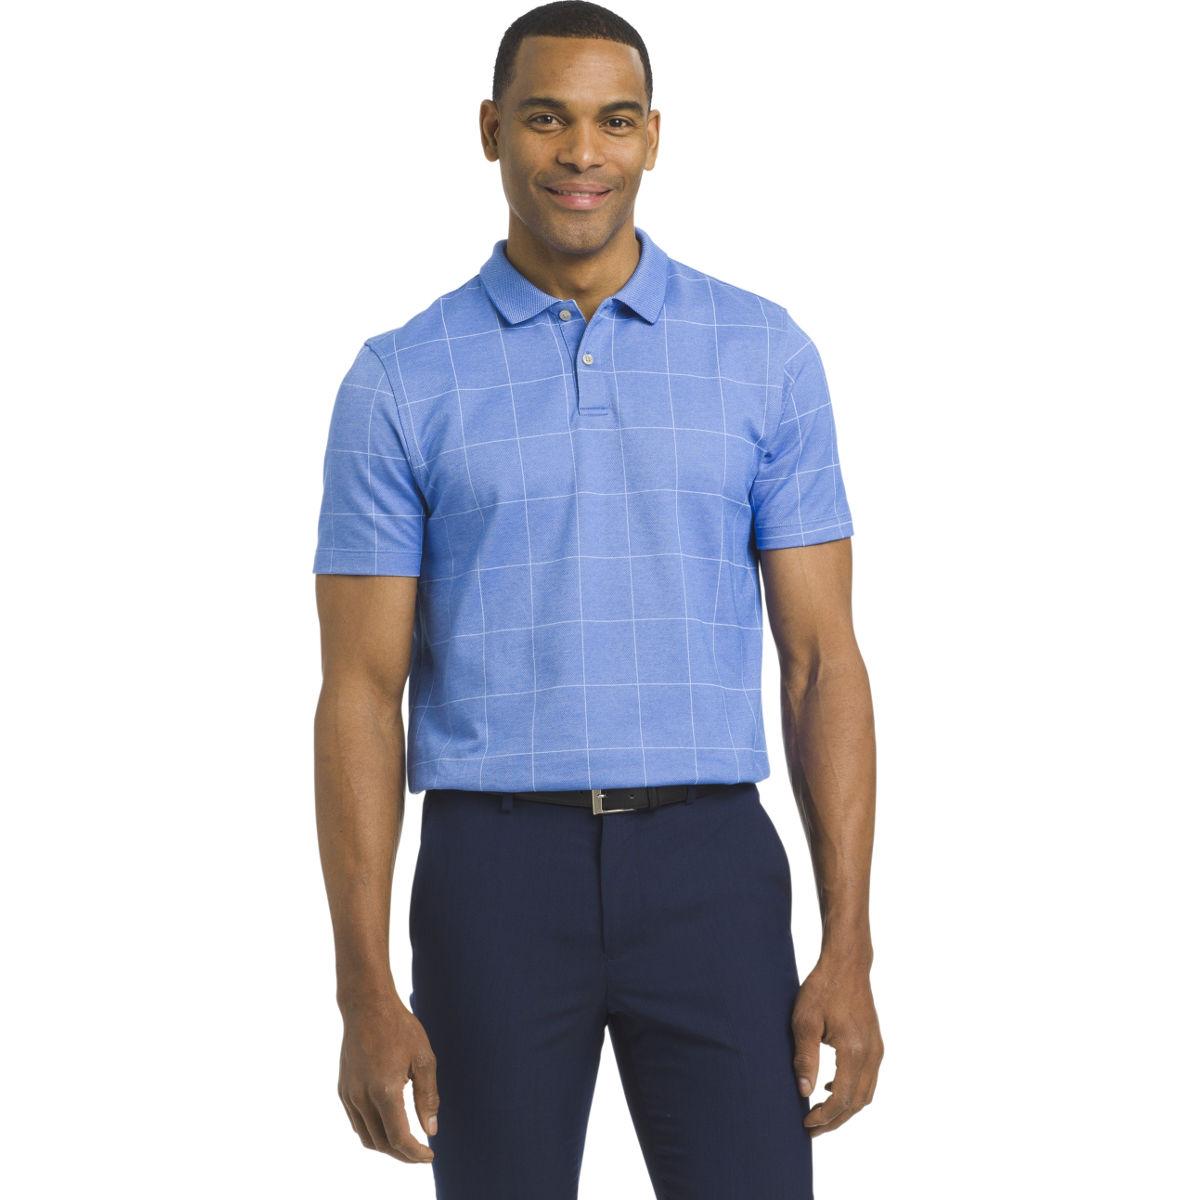 Van Heusen Men's Flex Print Windowpane Short-Sleeve Polo Shirt - Blue, M